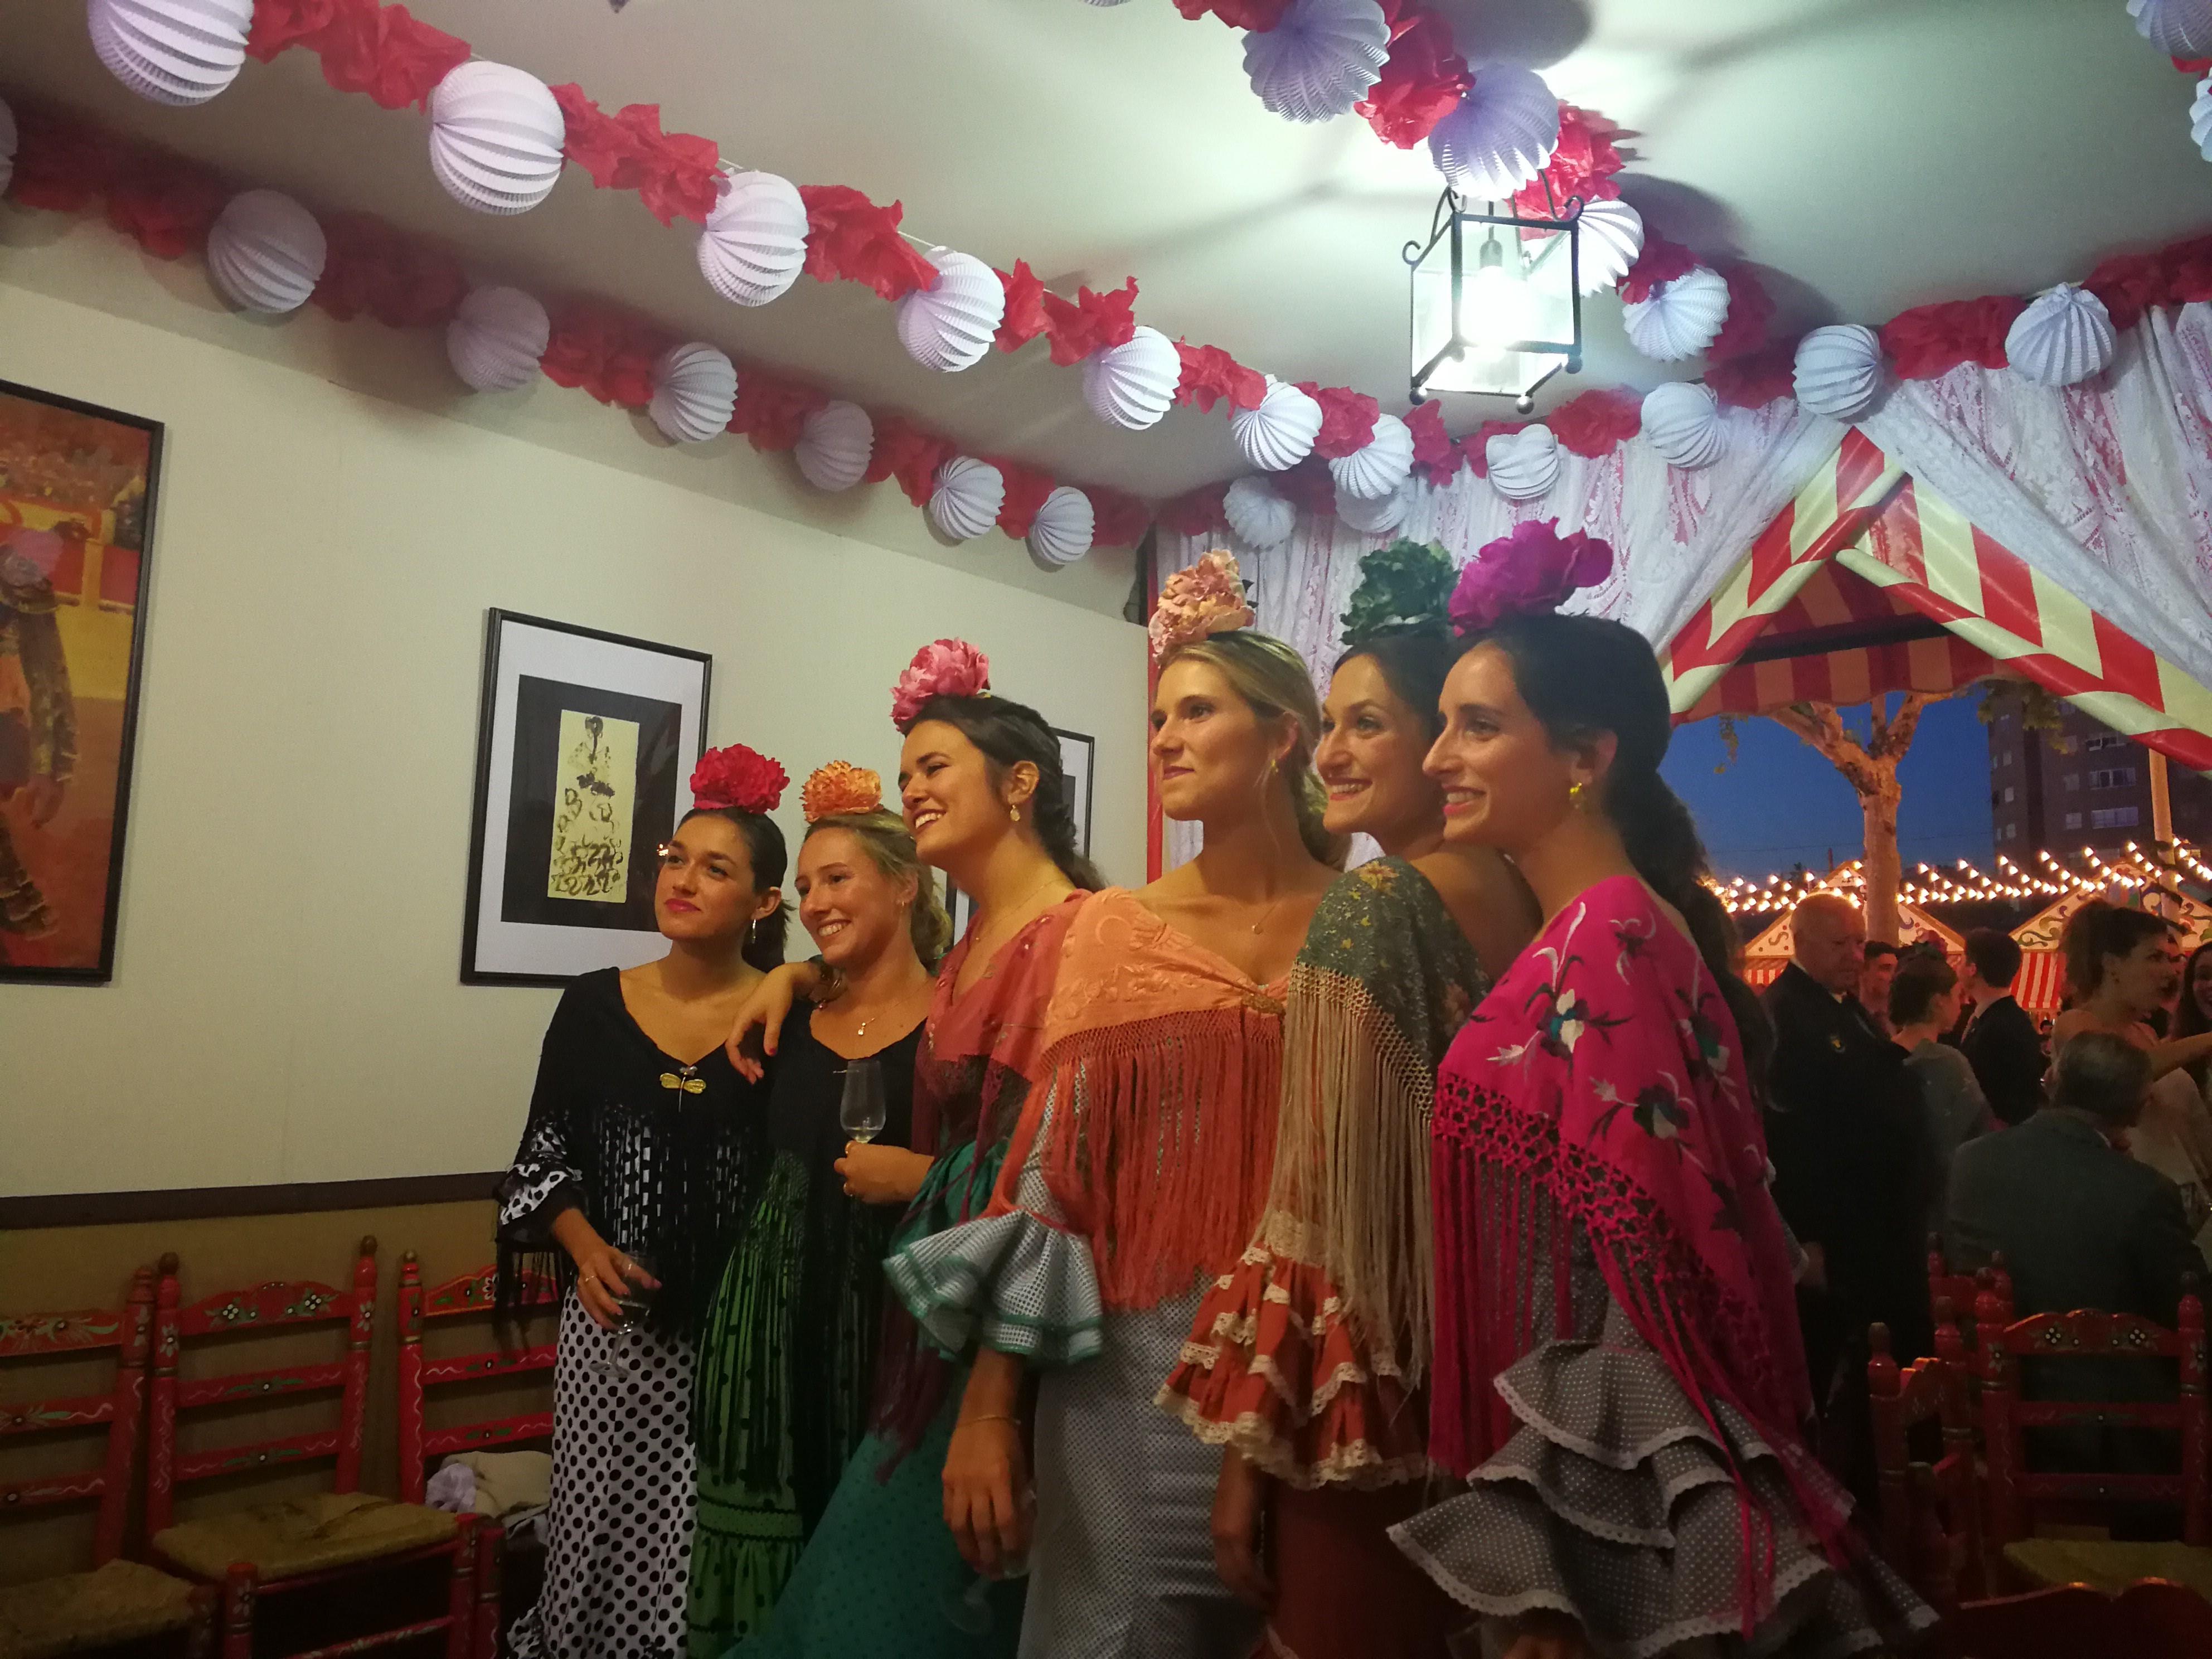 Gap Year Program - Seville Abroad: High School Exchange Program in Spain  1